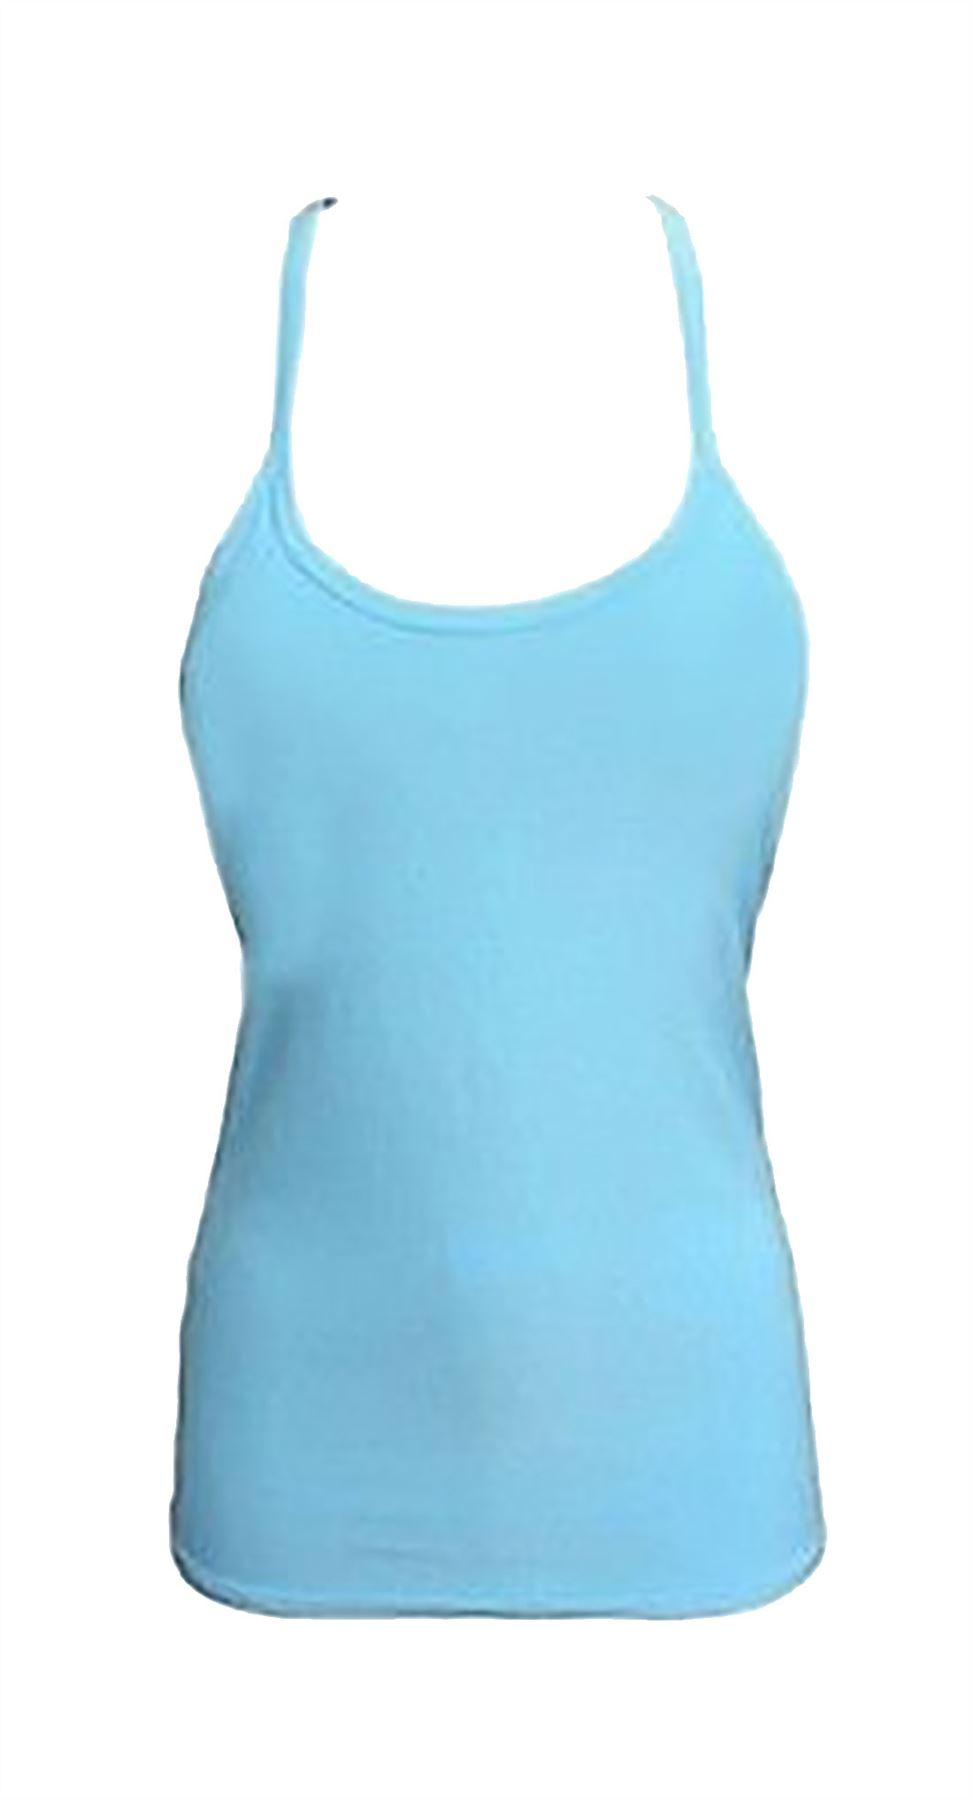 Womens Hot Pants And Vest Top Ladies Microfiber Lycra Dance Gym Outfit Short